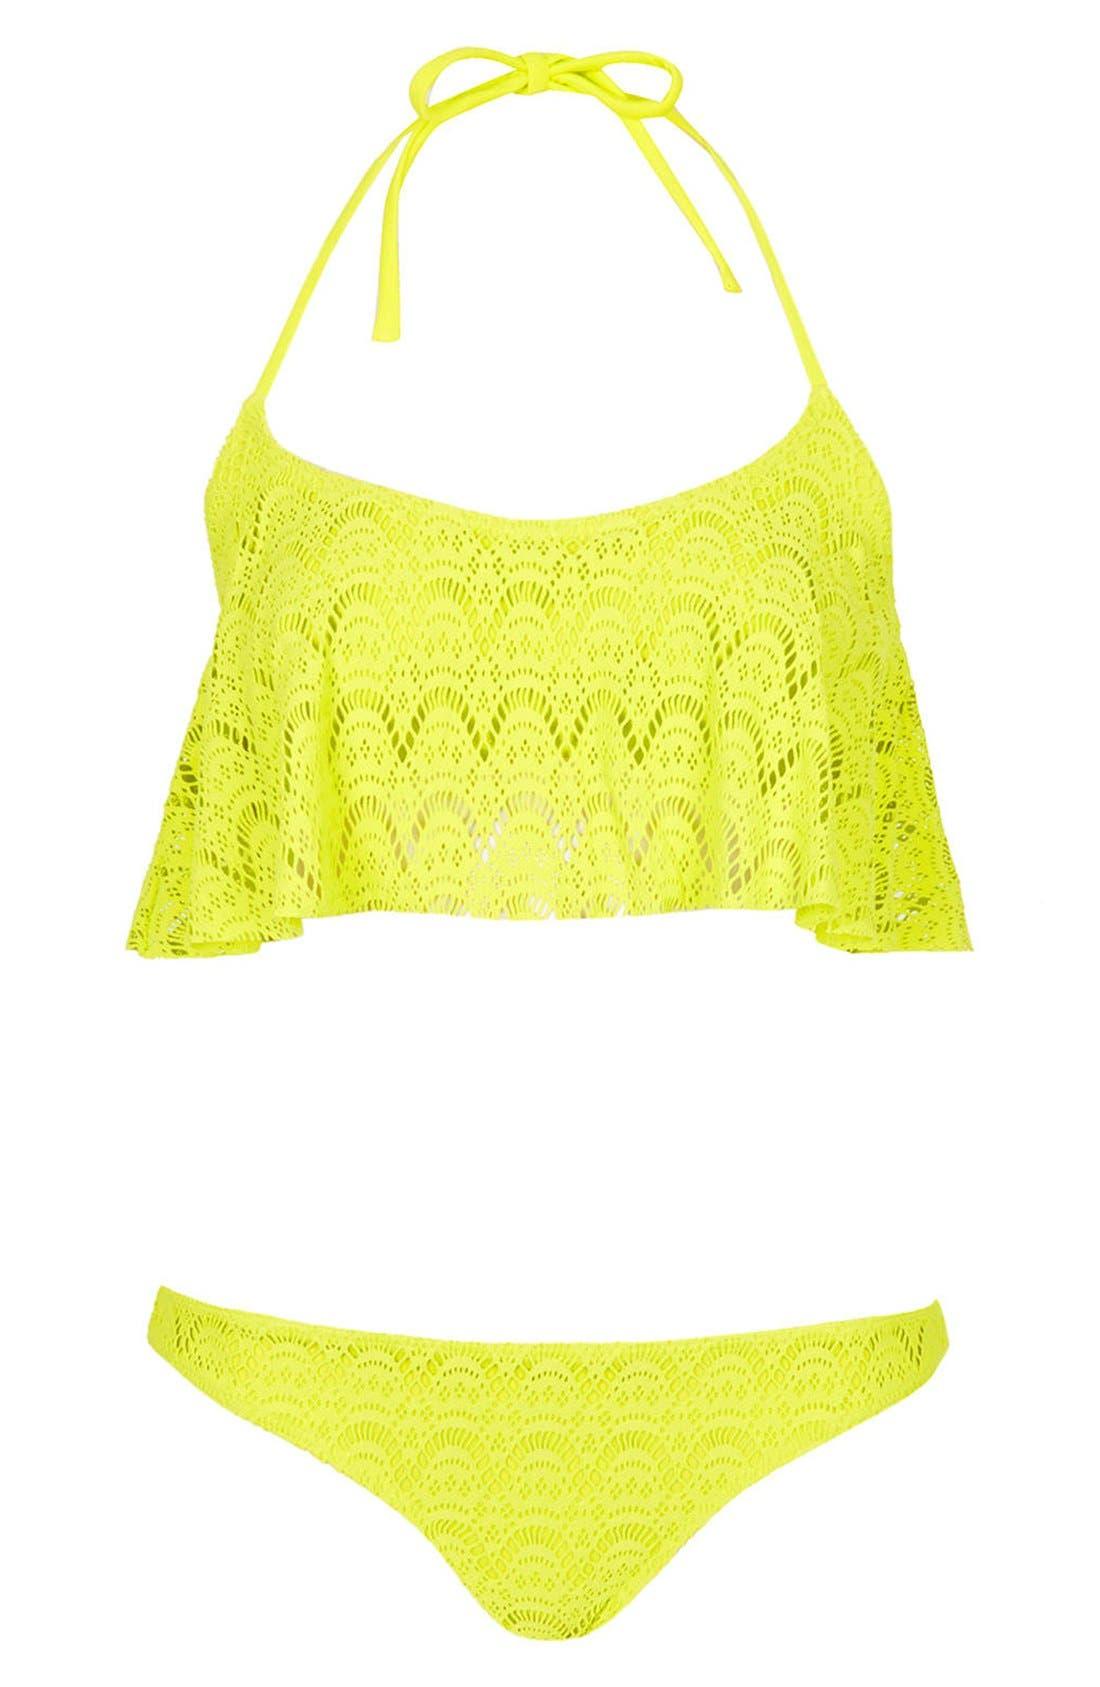 Main Image - Topshop Crochet Ruffle Panel Bikini